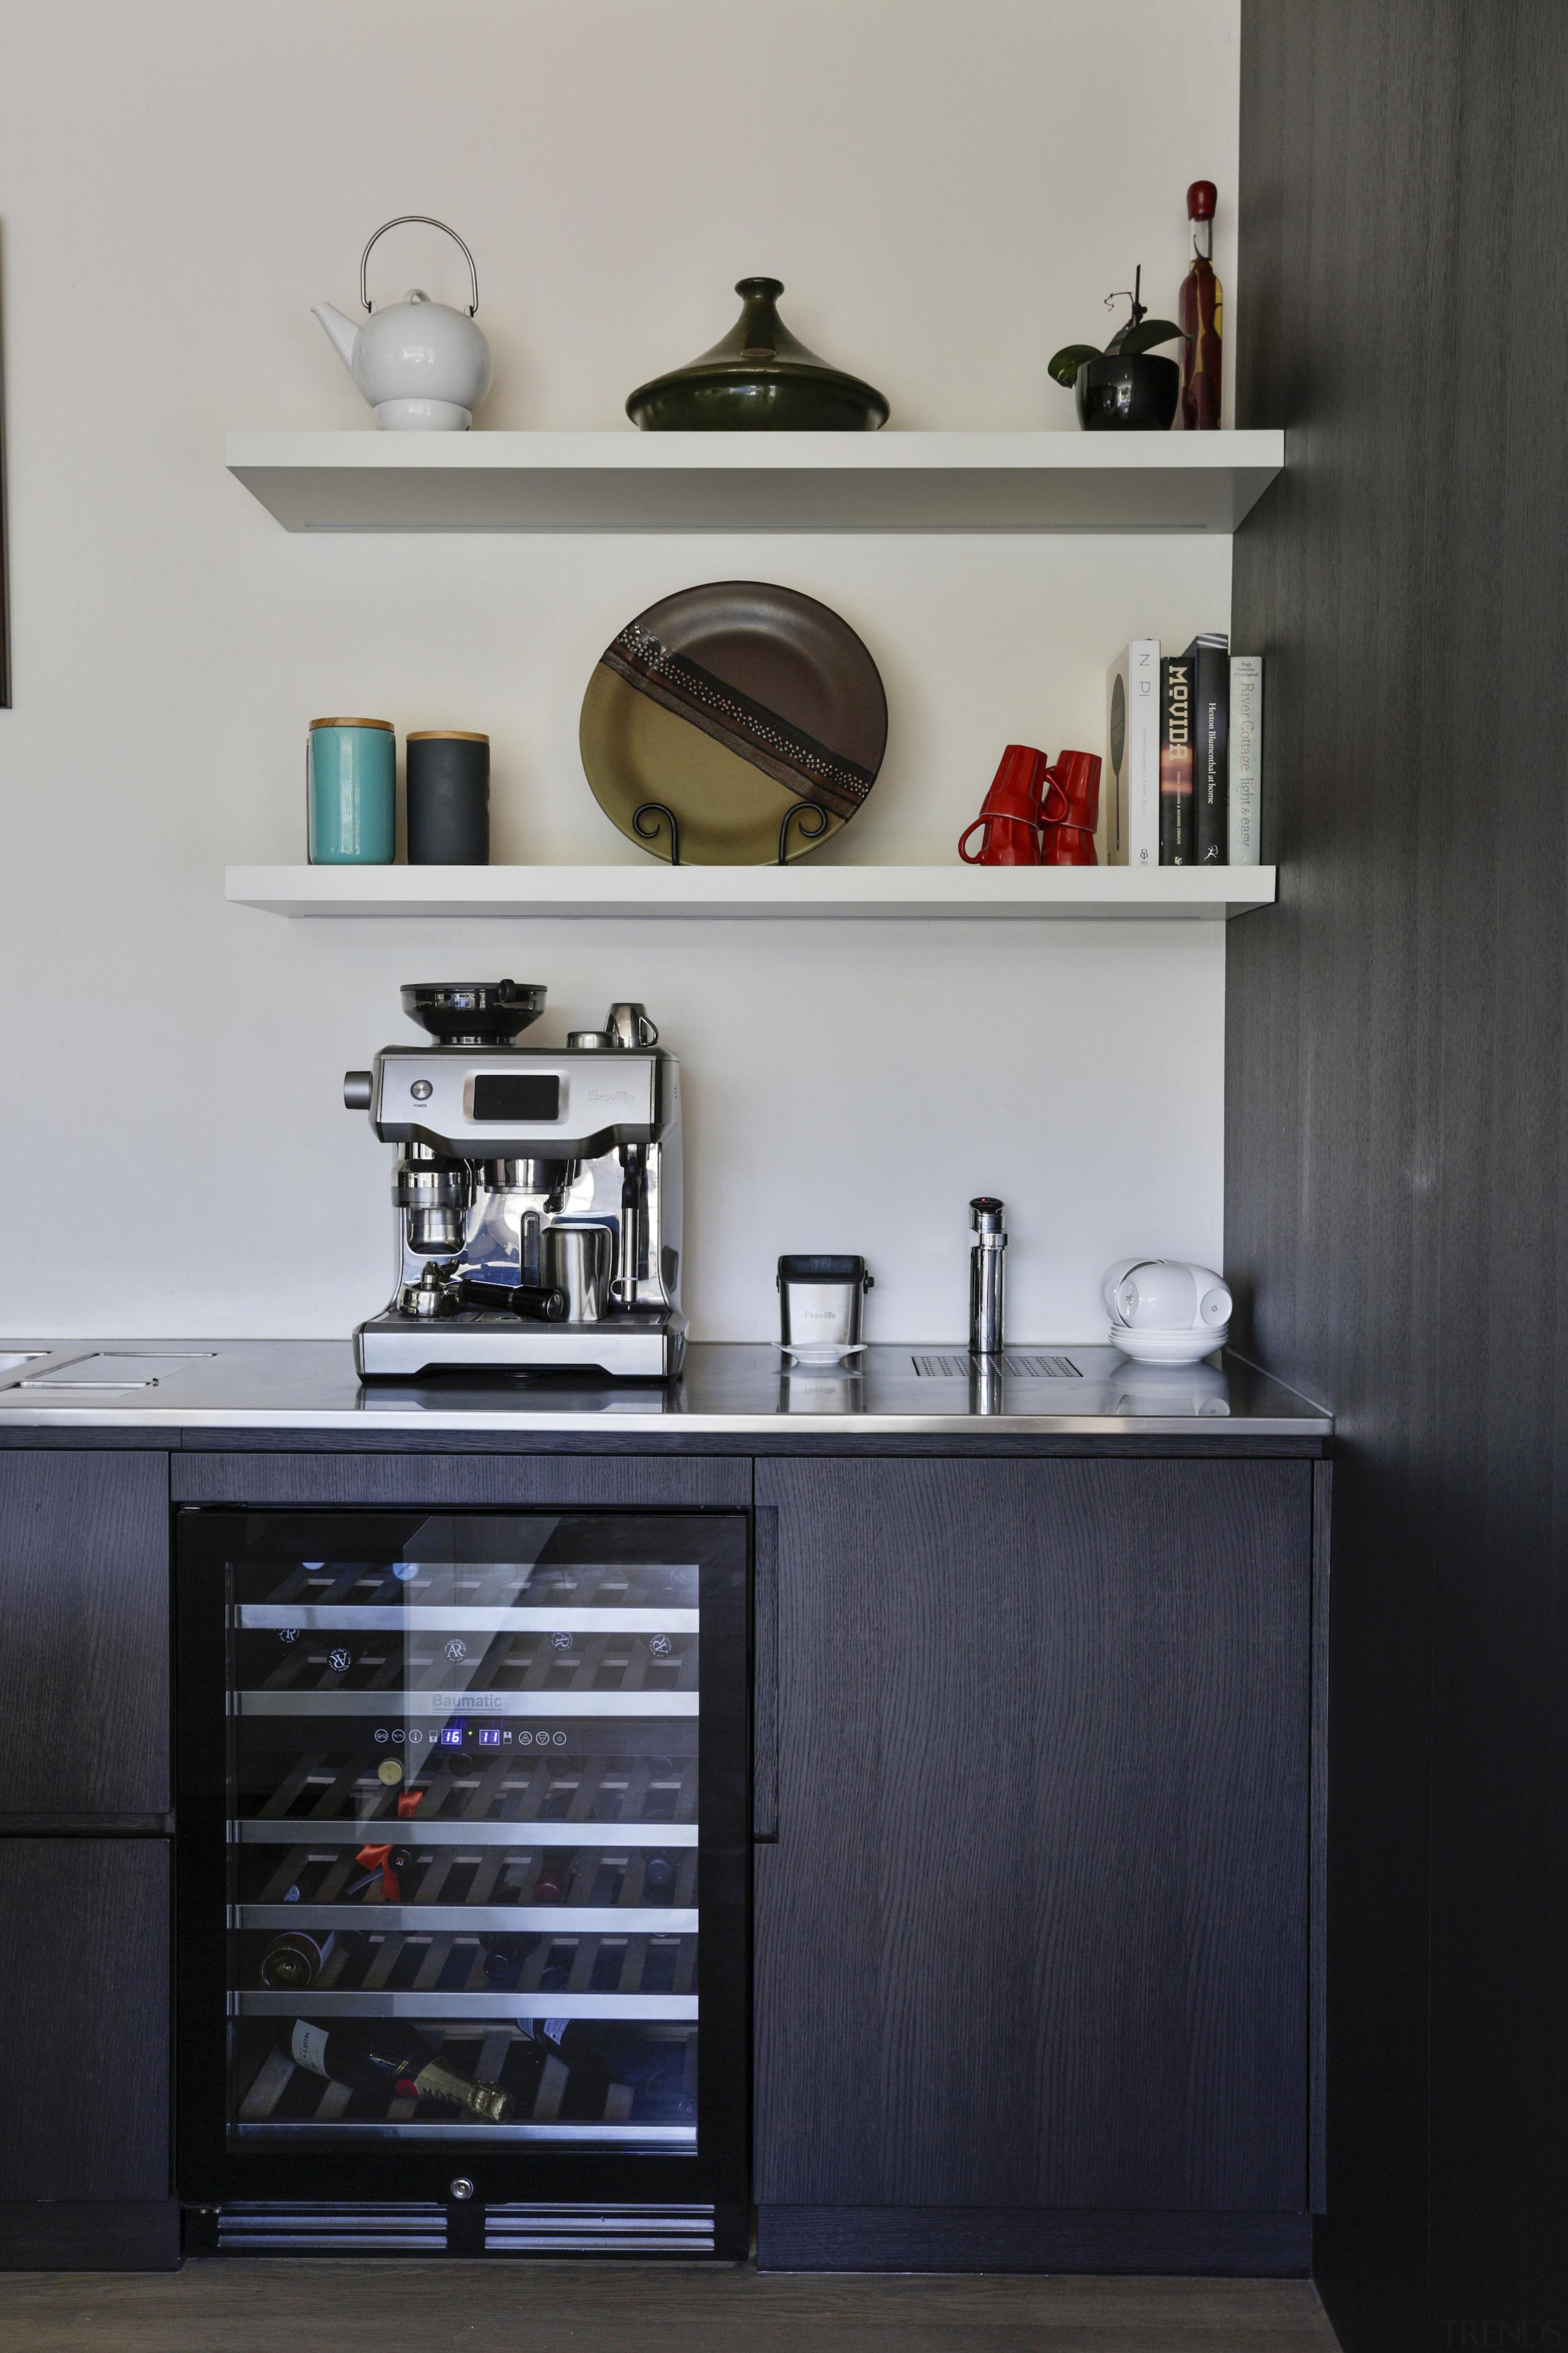 The kitchen boasts a Baumatic wine fridge. -